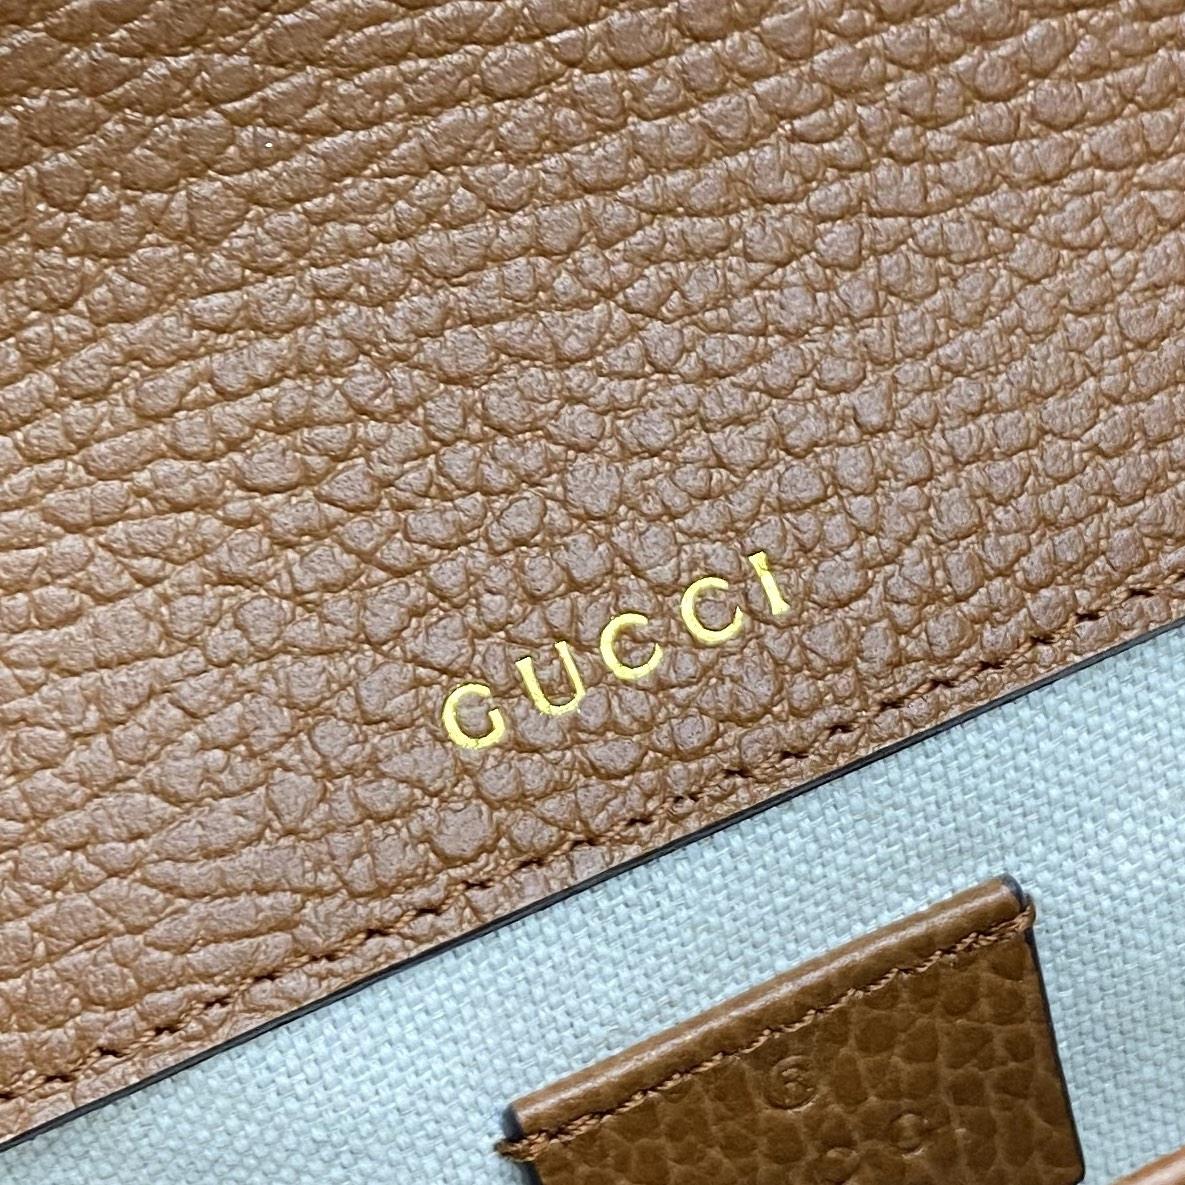 【P1280】Gucci新款女包 古奇1955系列牛仔马鞍包斜挎单肩包20CM